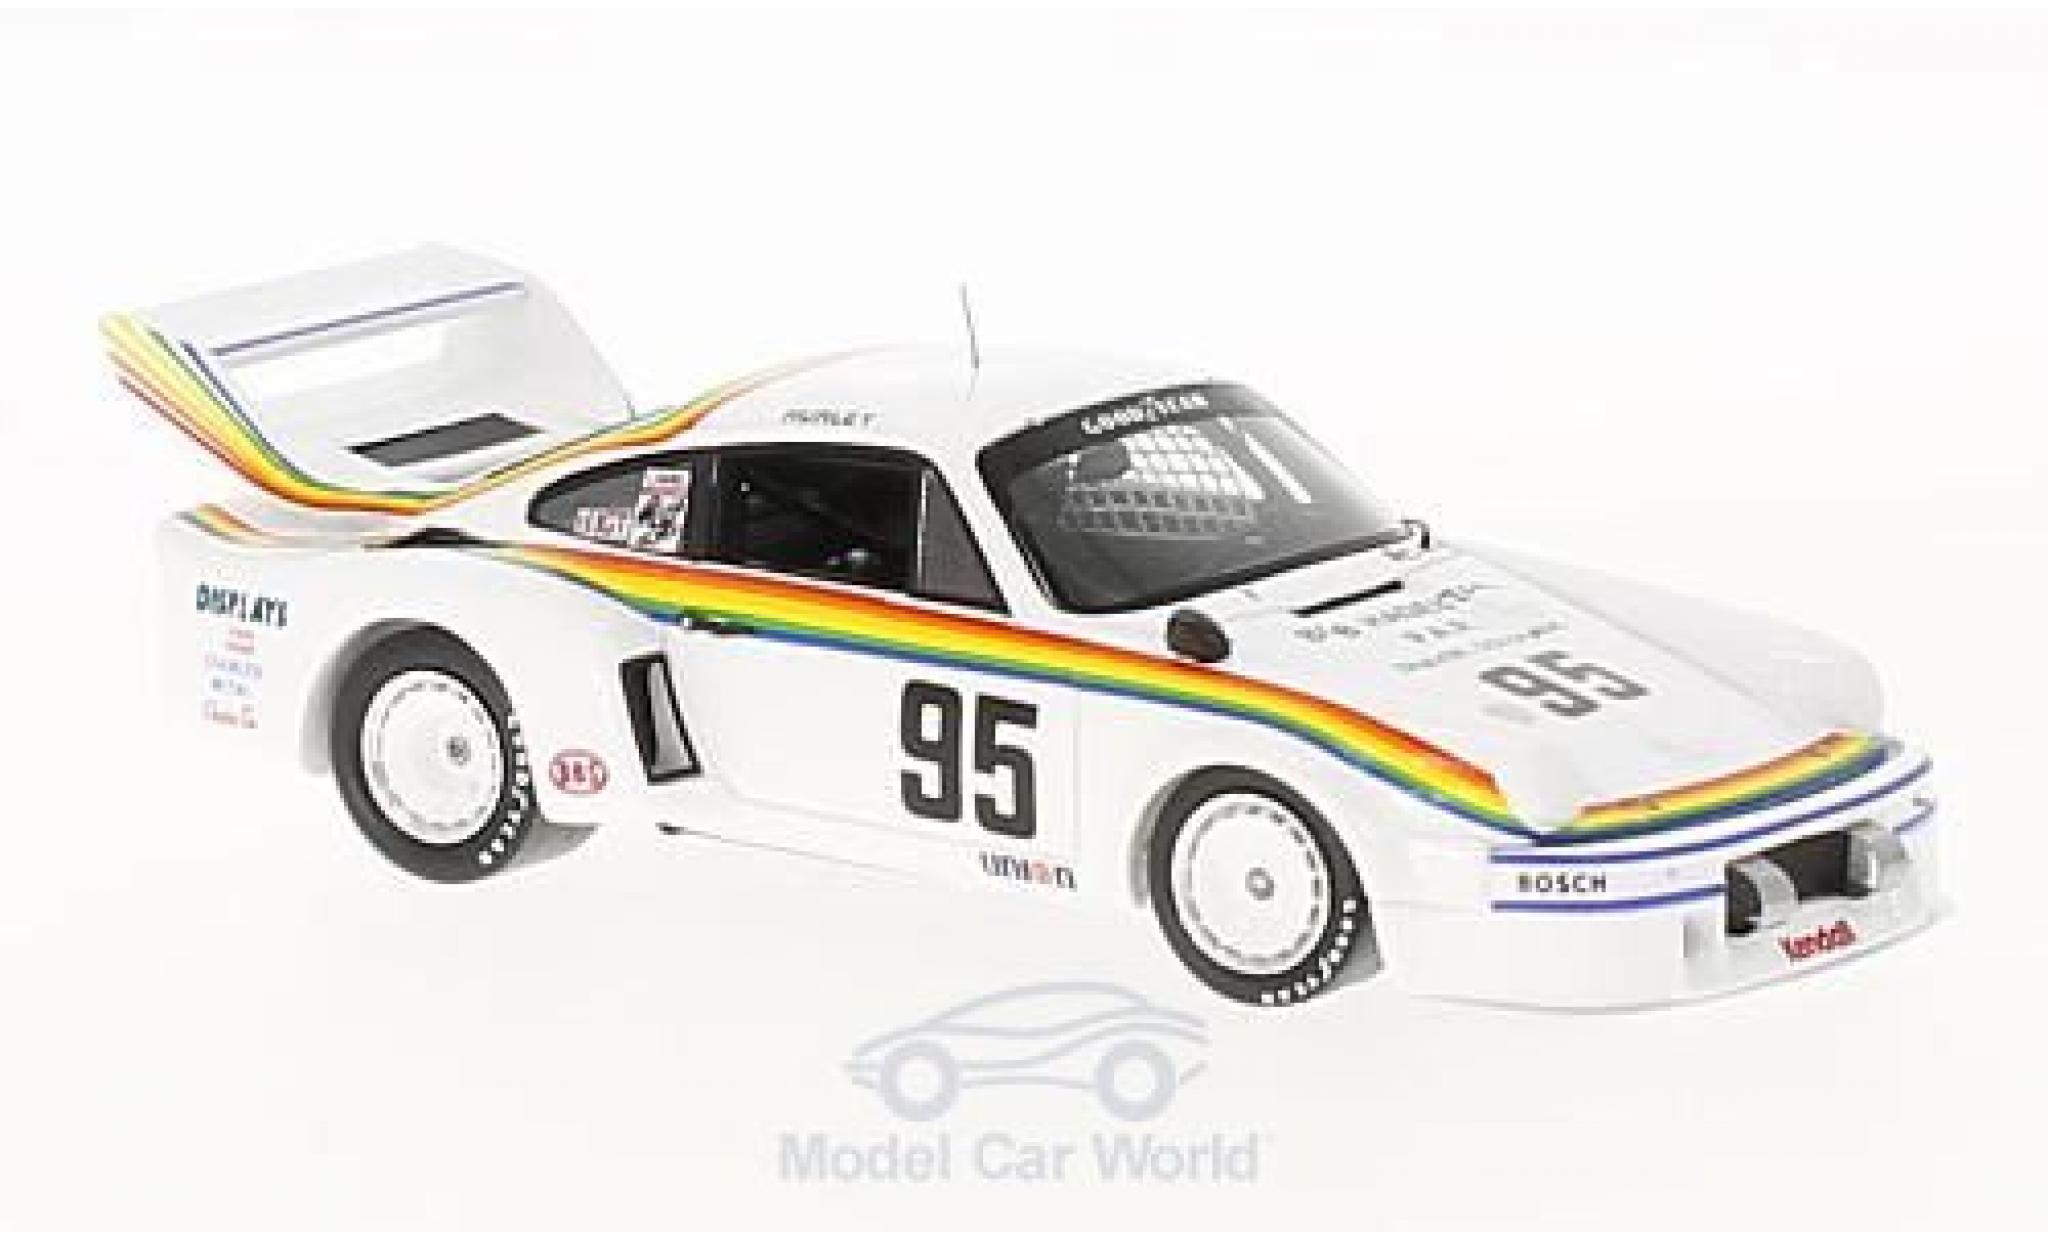 Porsche 934 1977 1/43 Spark /5 No.95 250 Miles Daytona H.Haywood